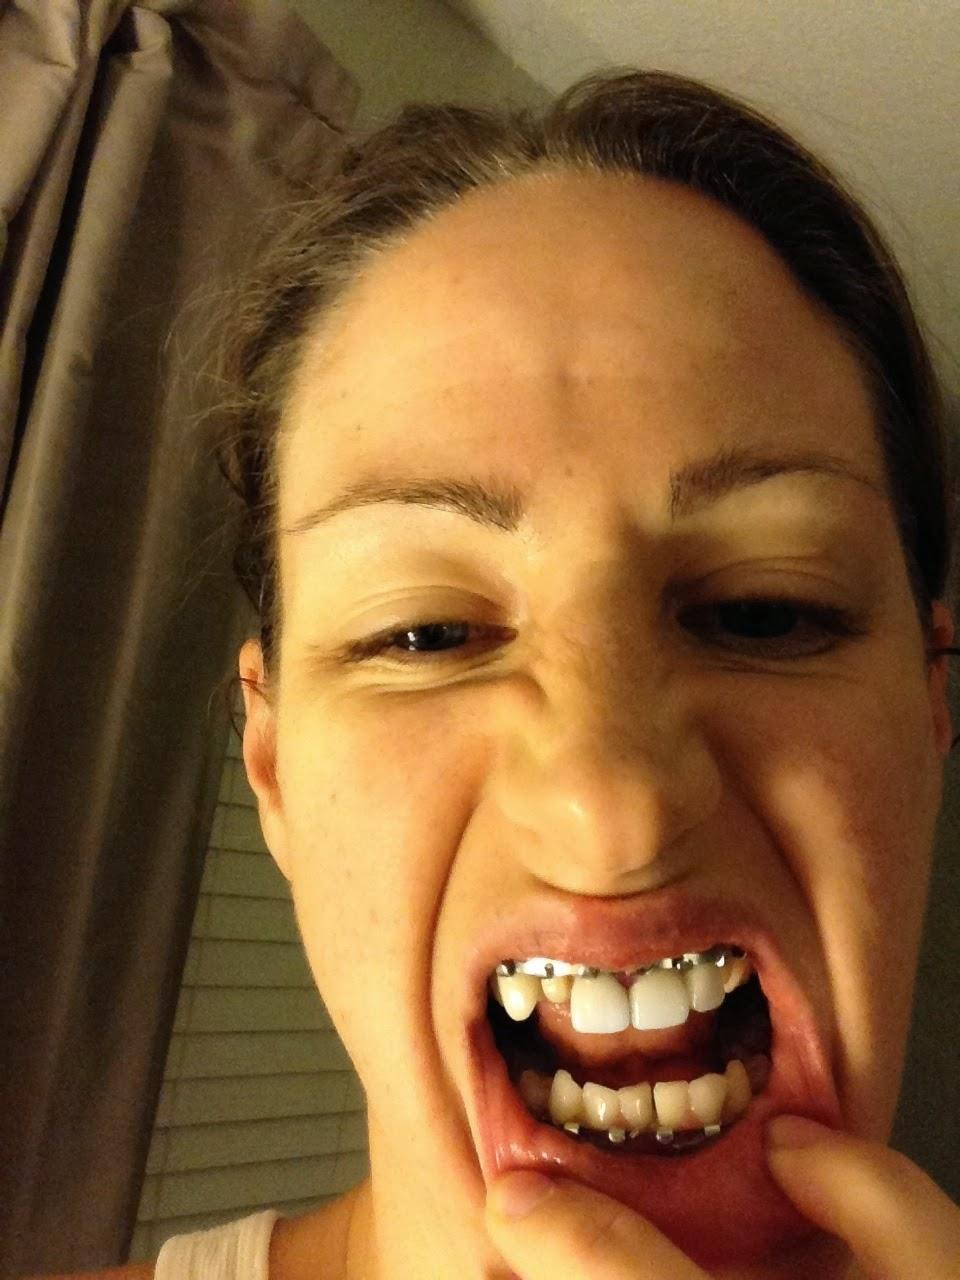 Wiring Mouth Shut For Broken Jaw